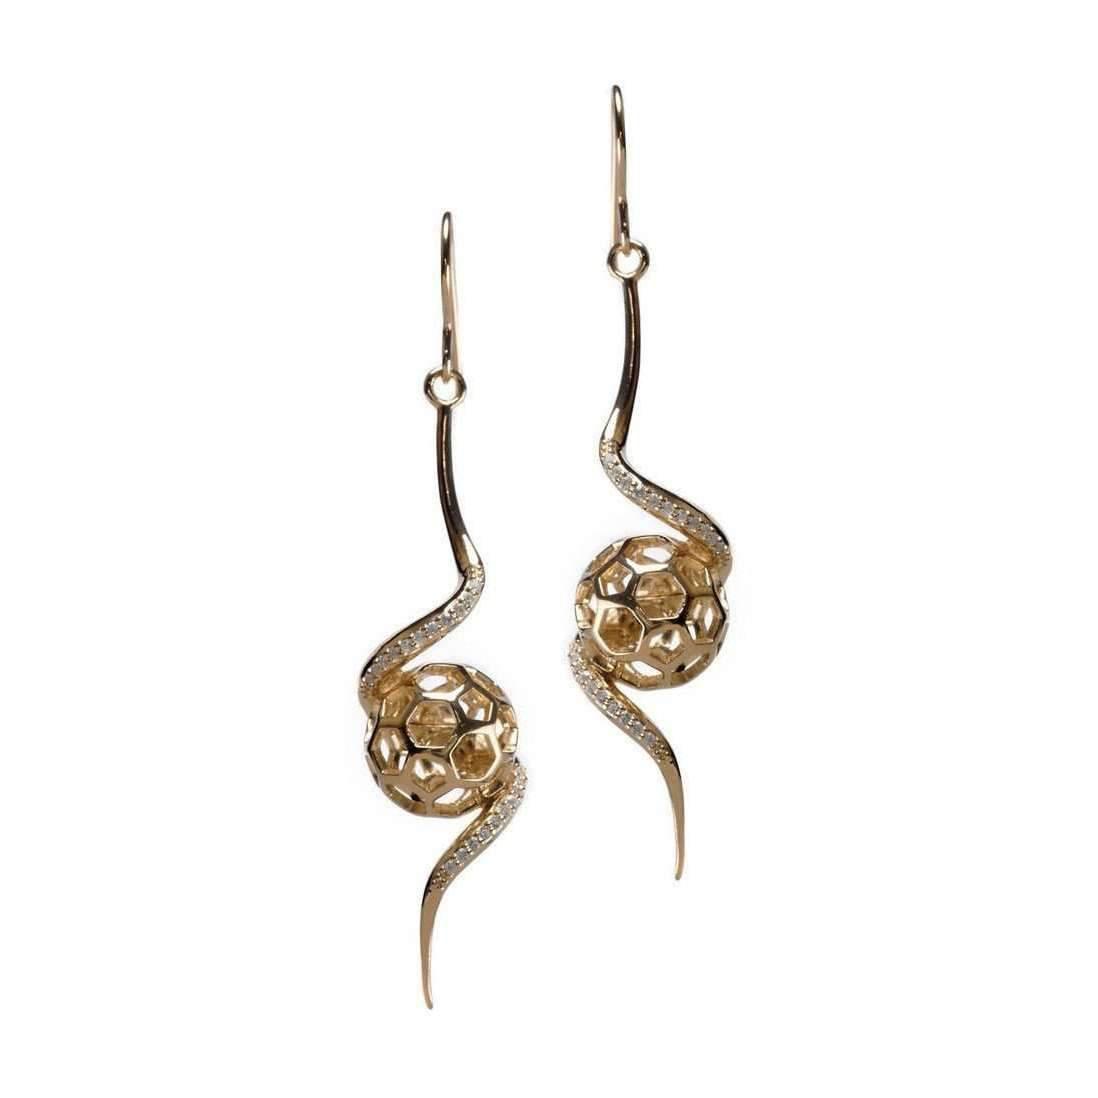 Gia Belloni Gold Polished Aeon Earrings iCzczxw5m